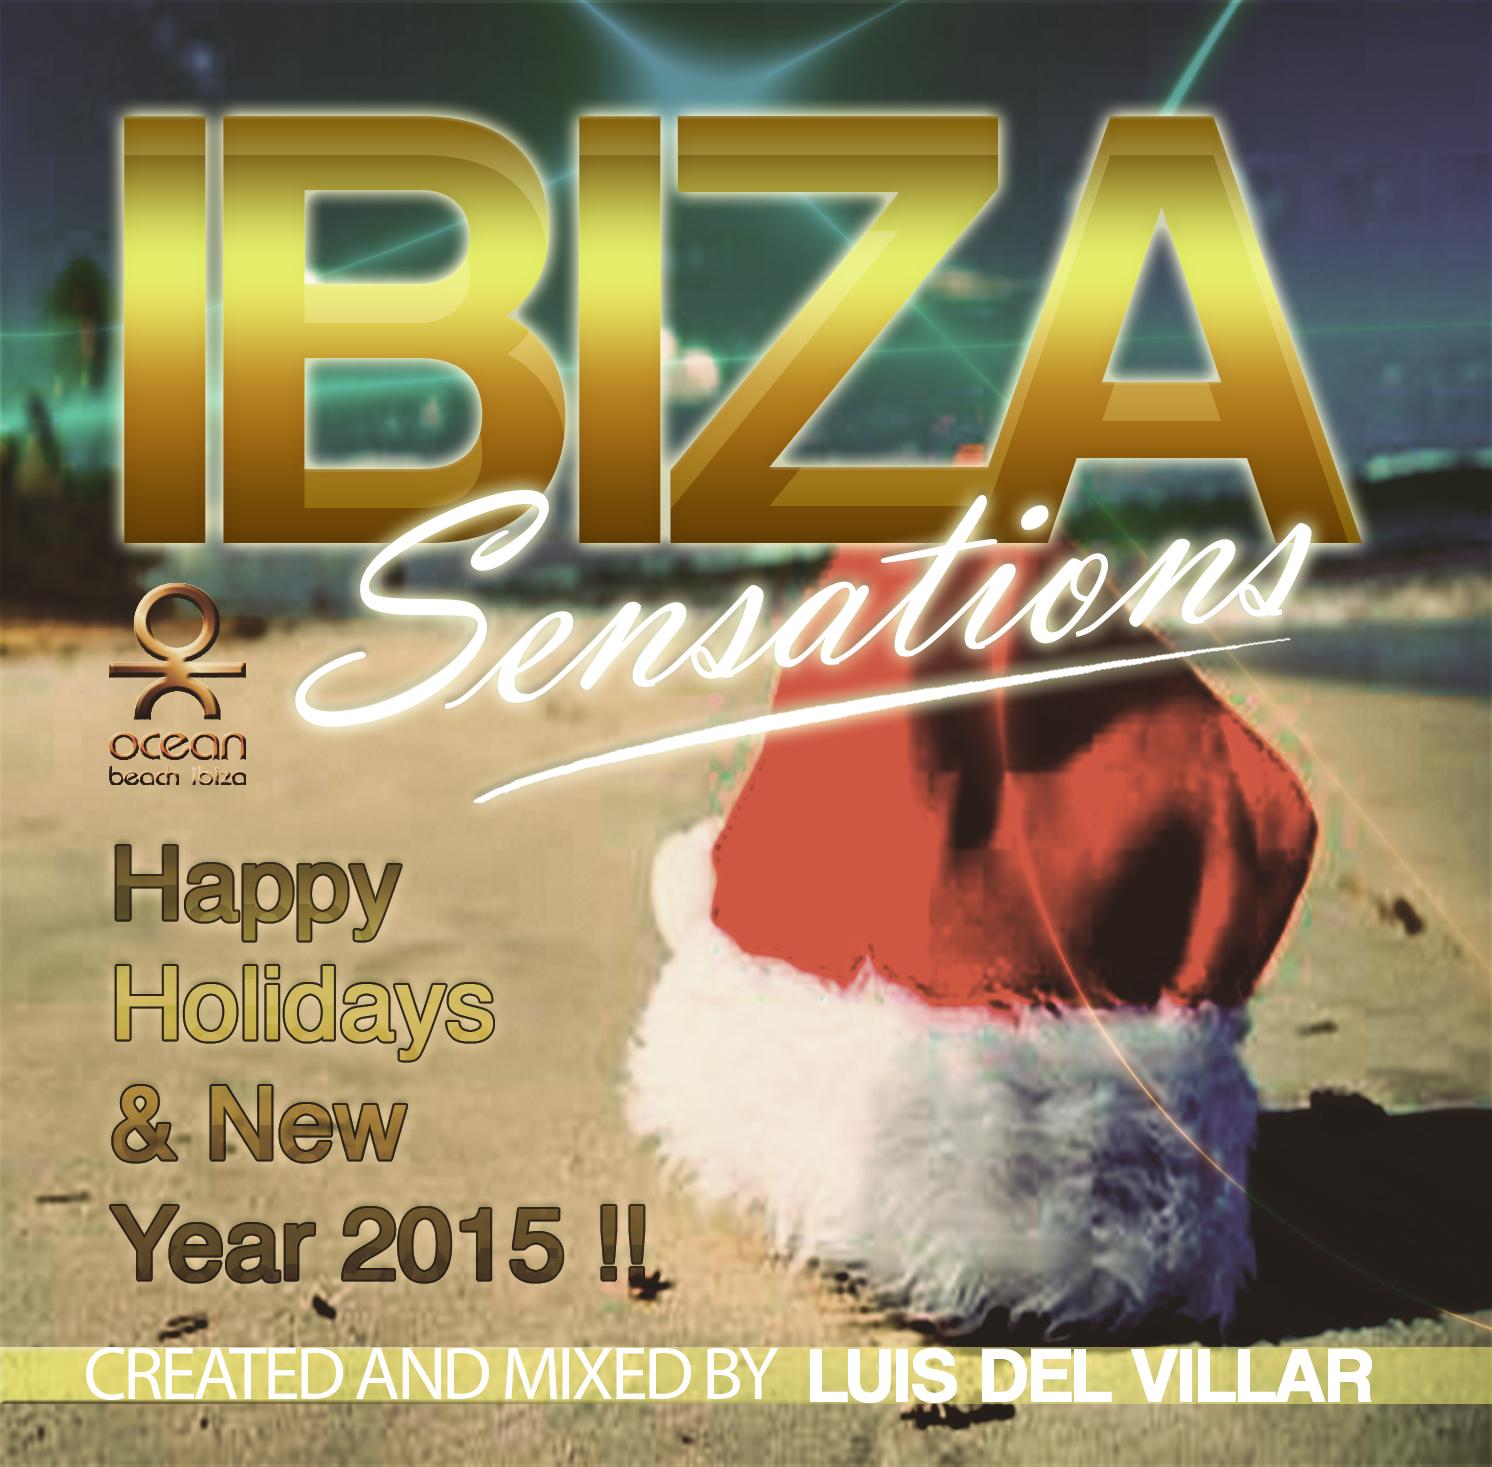 Artwork for Ibiza Sensations 107 Happy Holidays & New Year 2015